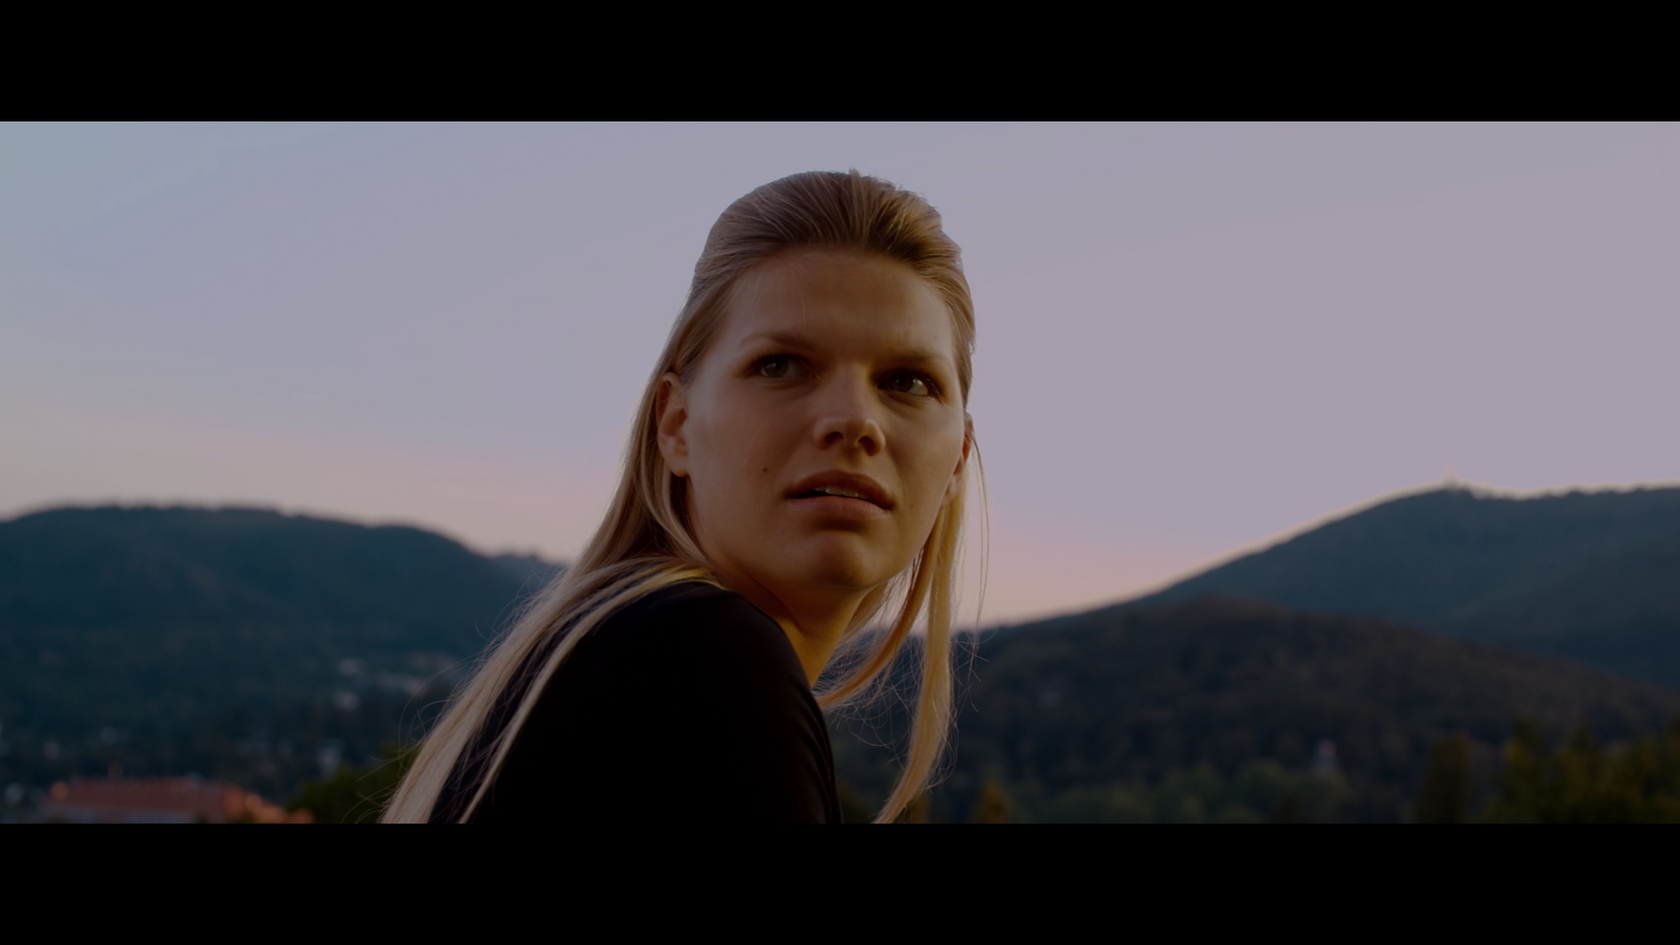 Desirée Altig as Natalja Mayer